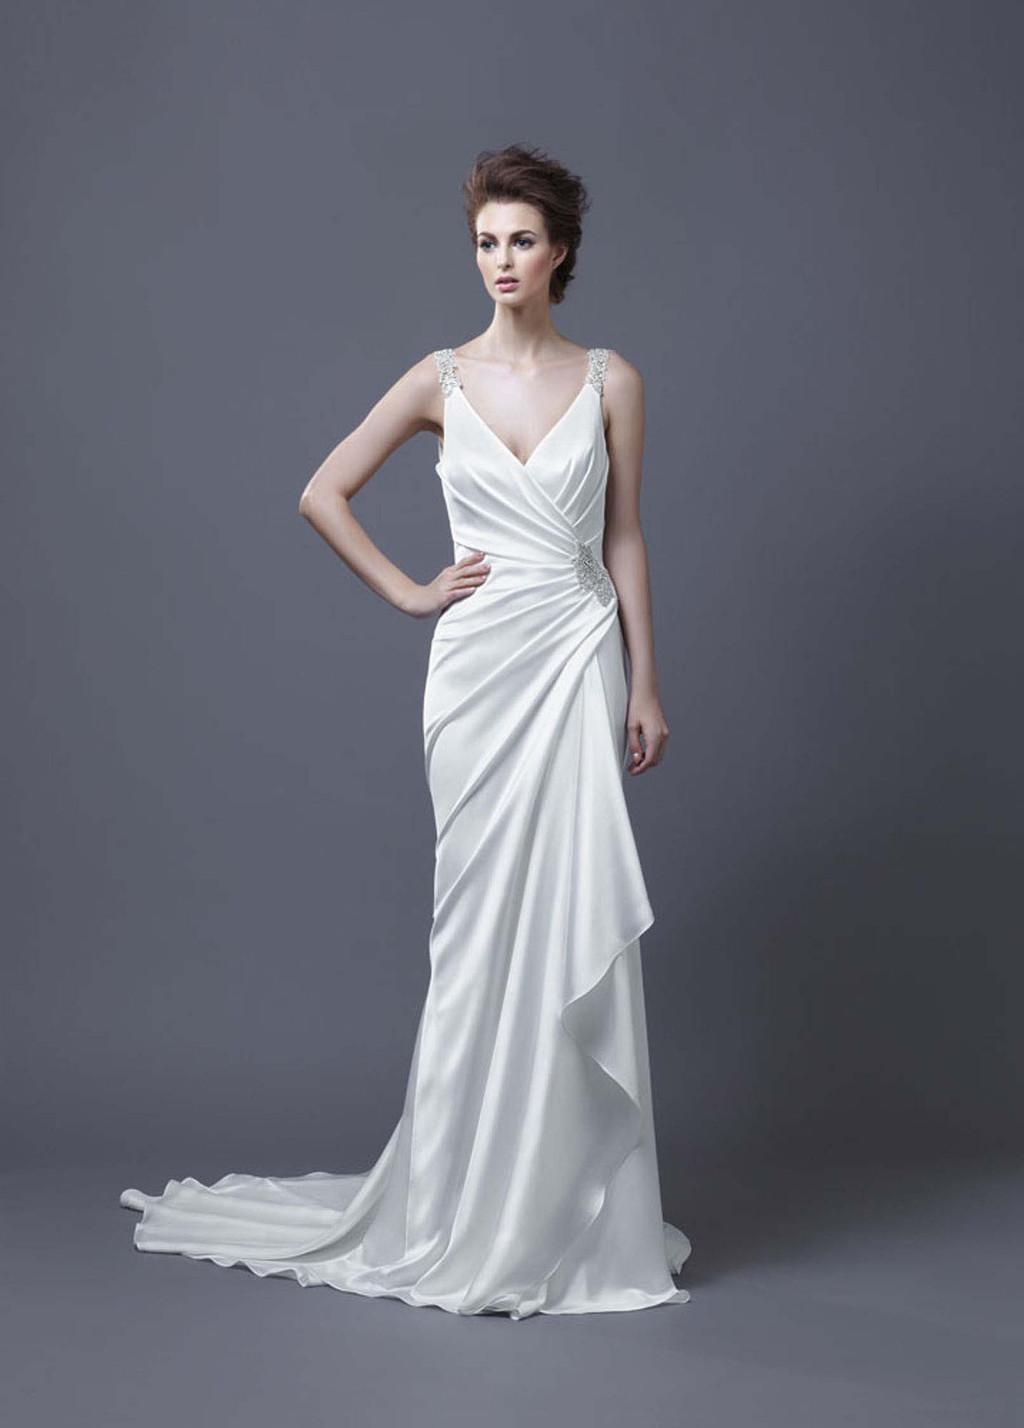 2013-wedding-dress-by-enzoani-bridal-harmony.full